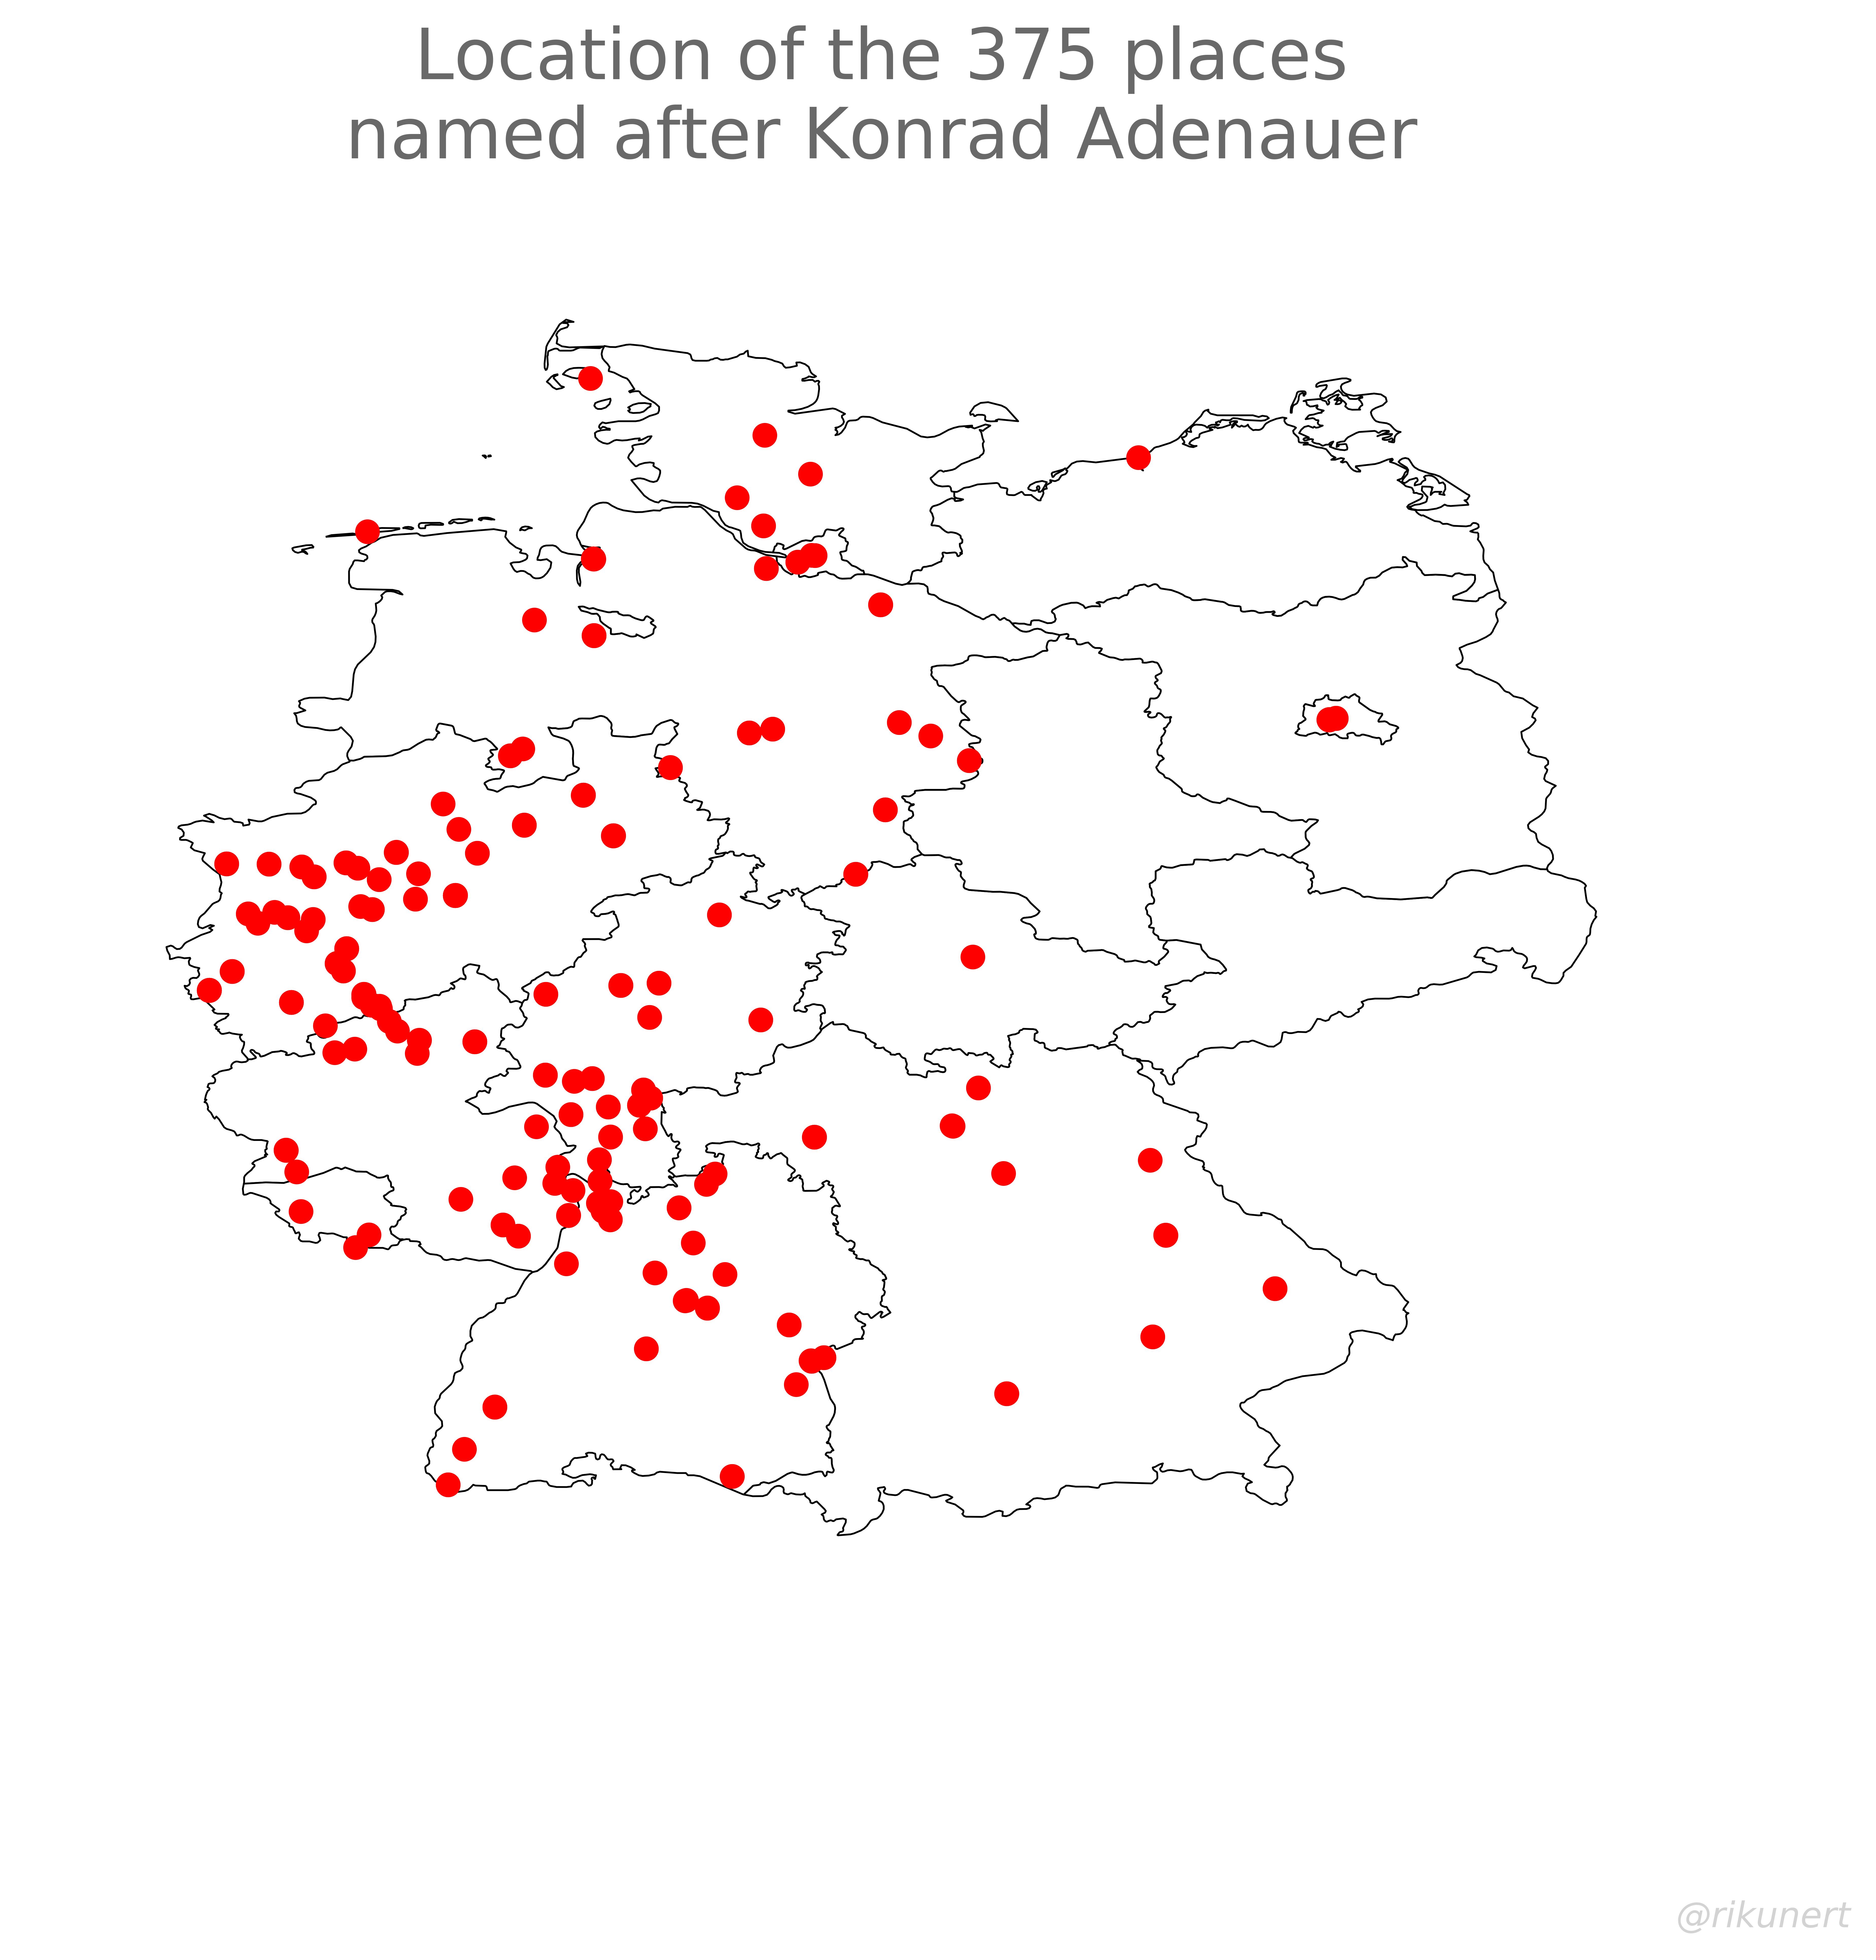 Konrad Adenauer place names scatter plot